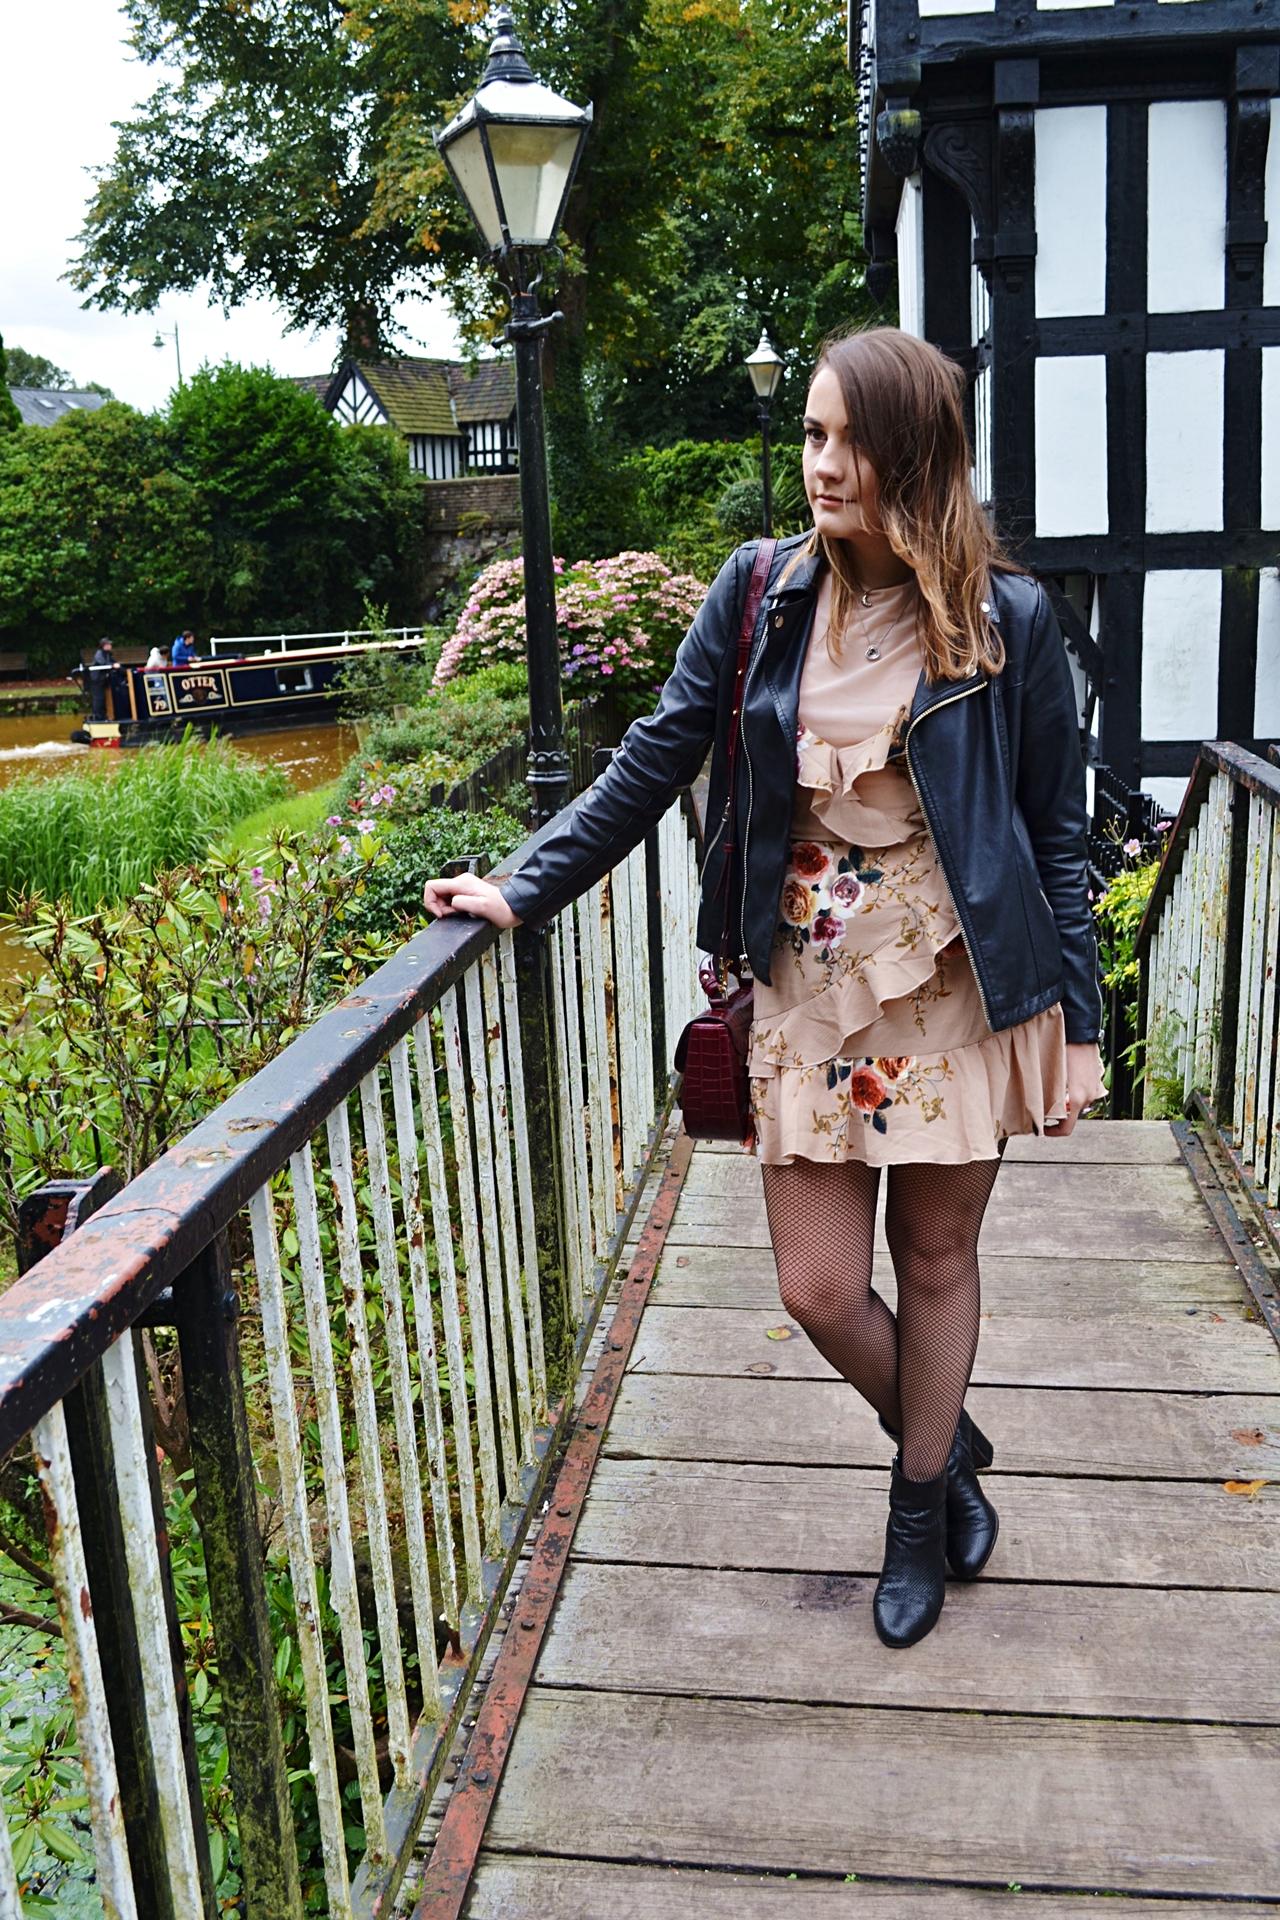 worsley village photoshoot fashion styleetc style etc